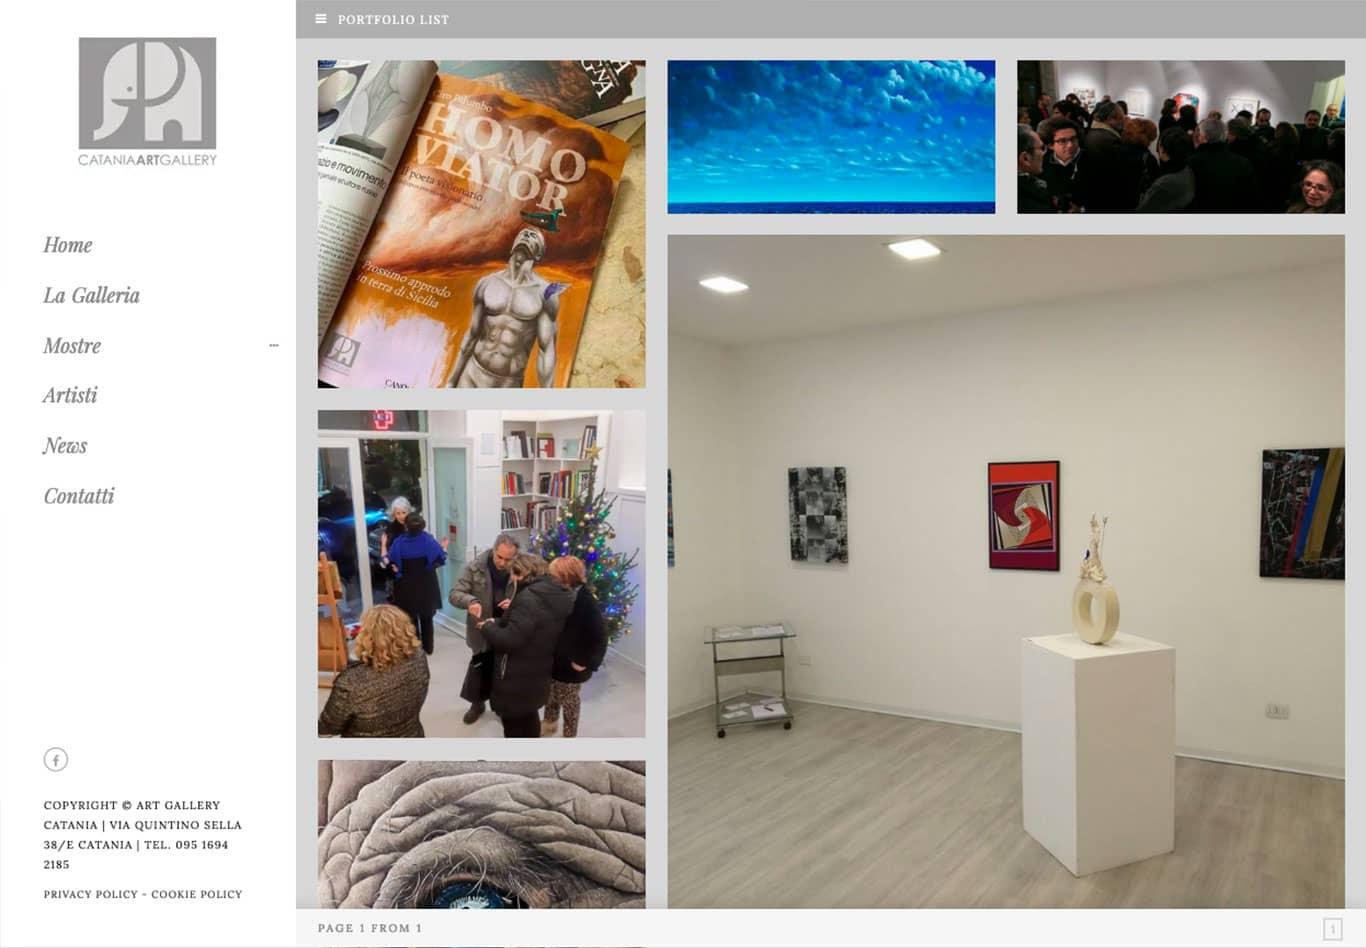 screenshot i nostri successi con Art Gallery Catania